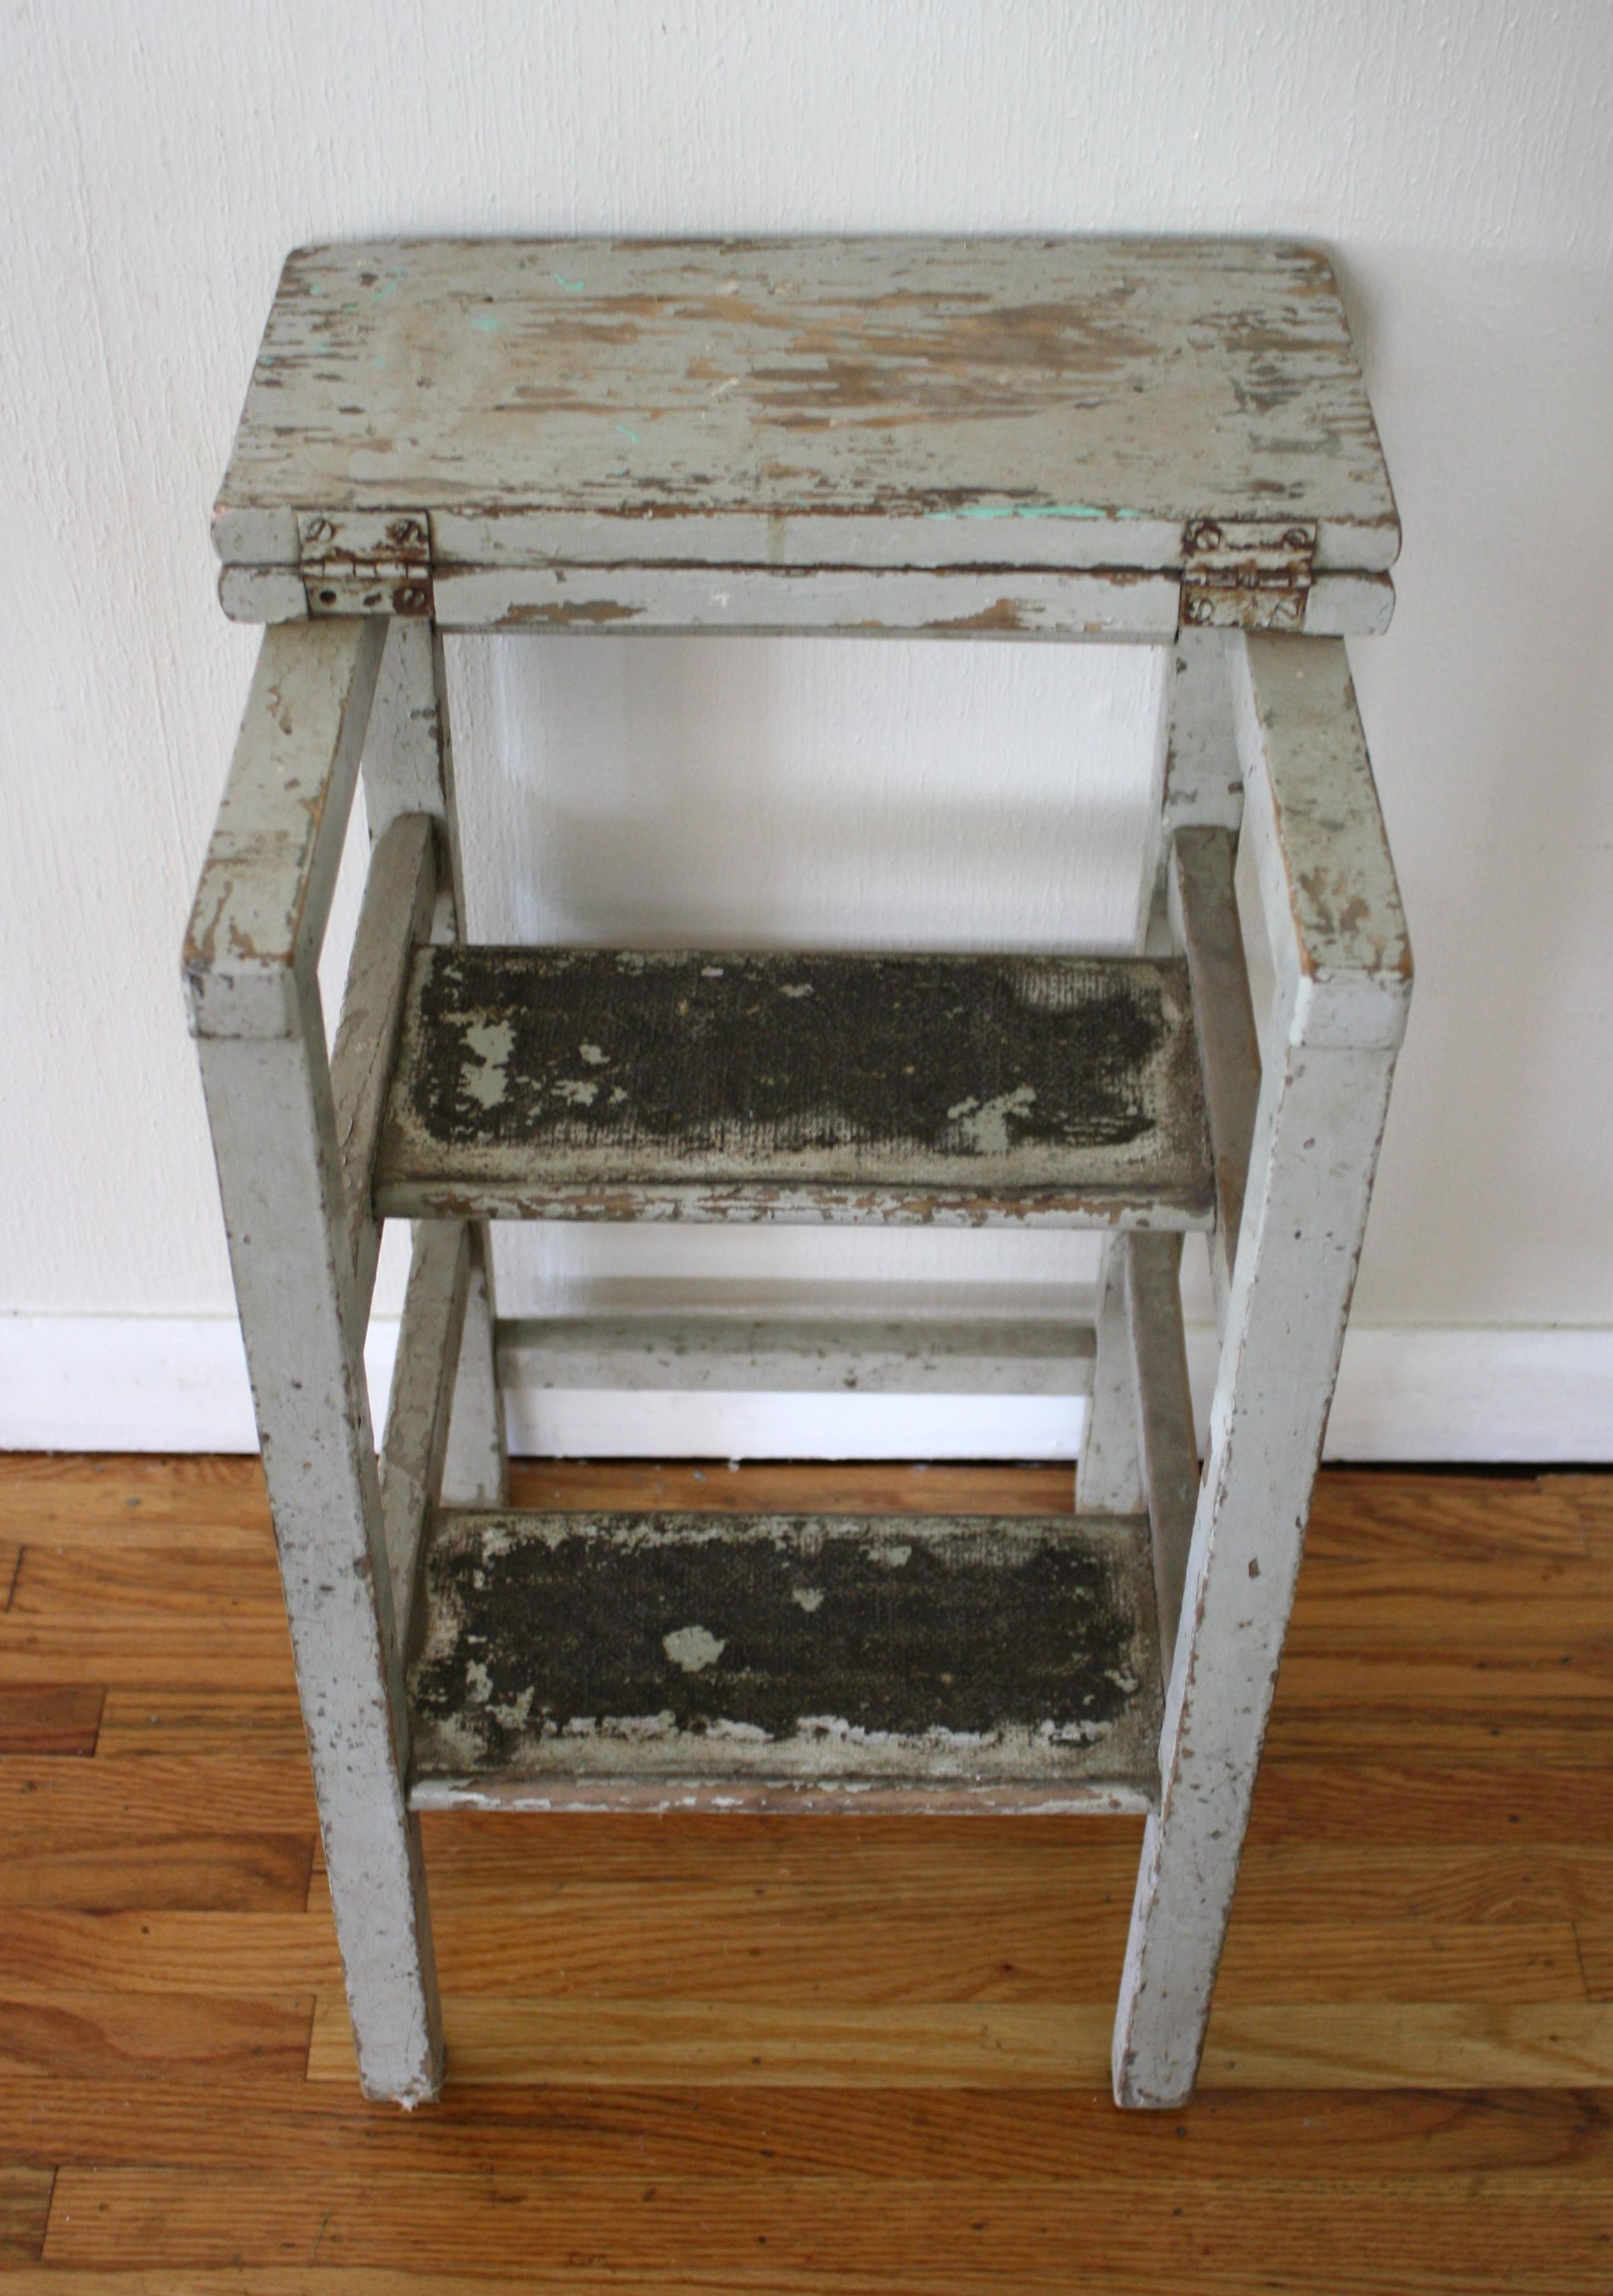 Antique Rustic Step Stool Picked Vintage